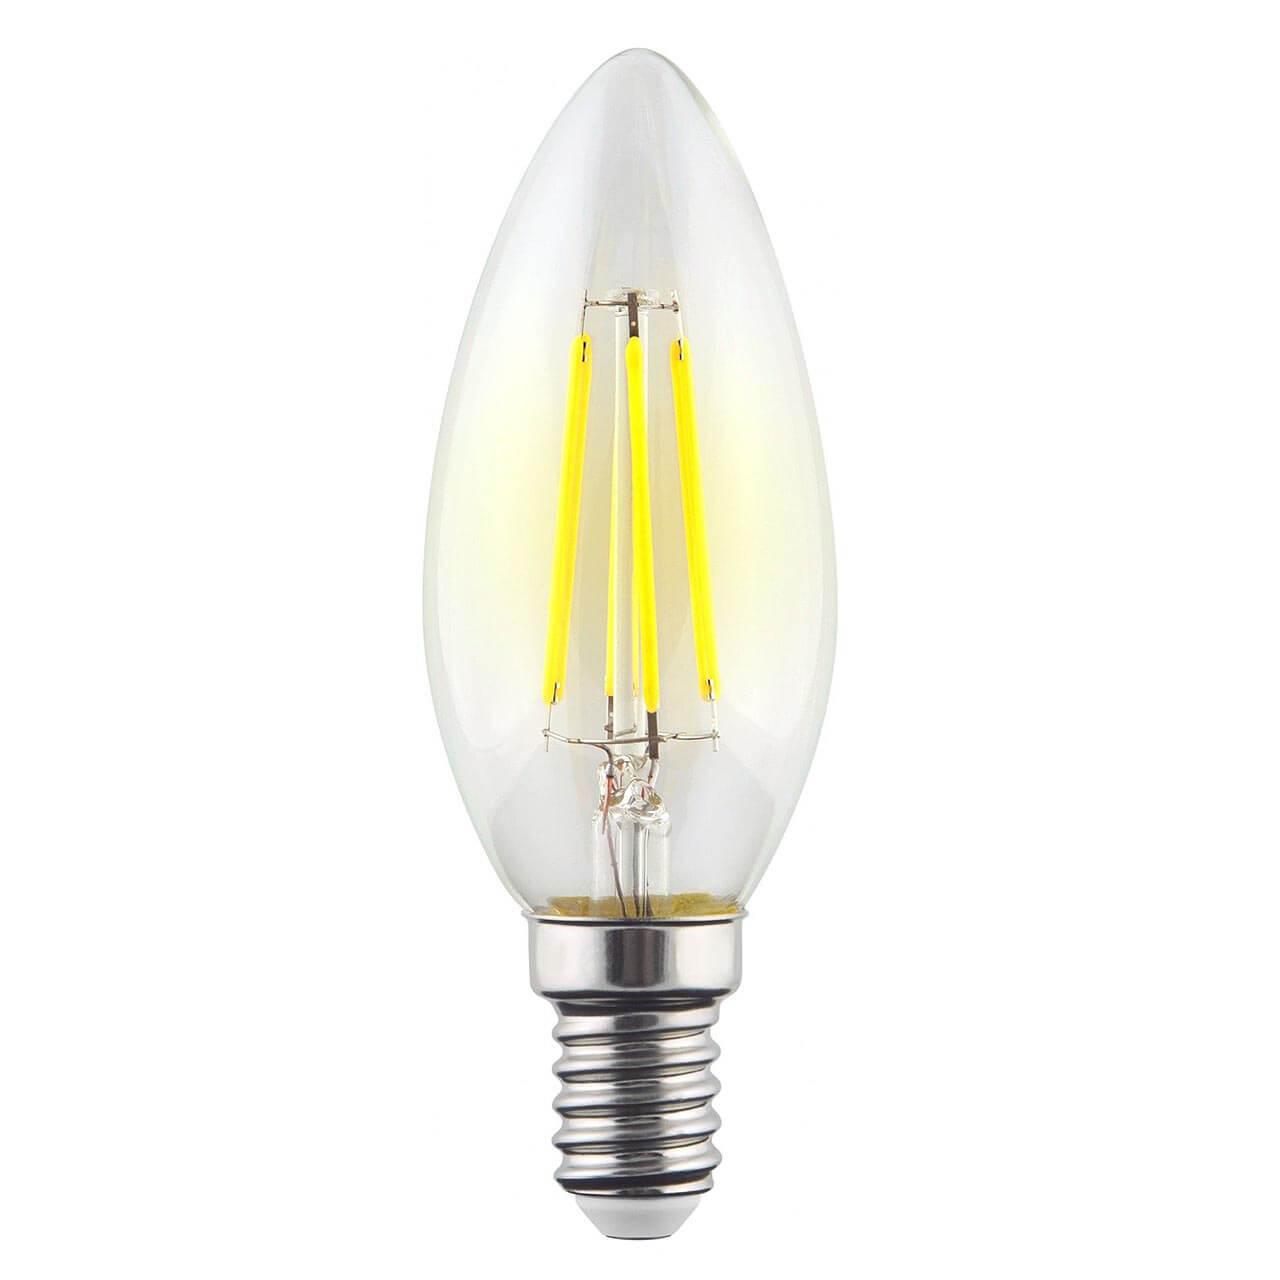 Лампа светодиодная филаментная Voltega E14 9W 2800К прозрачная VG10-C1E14warm9W-F 7096 ретро лампа 5928 voltega